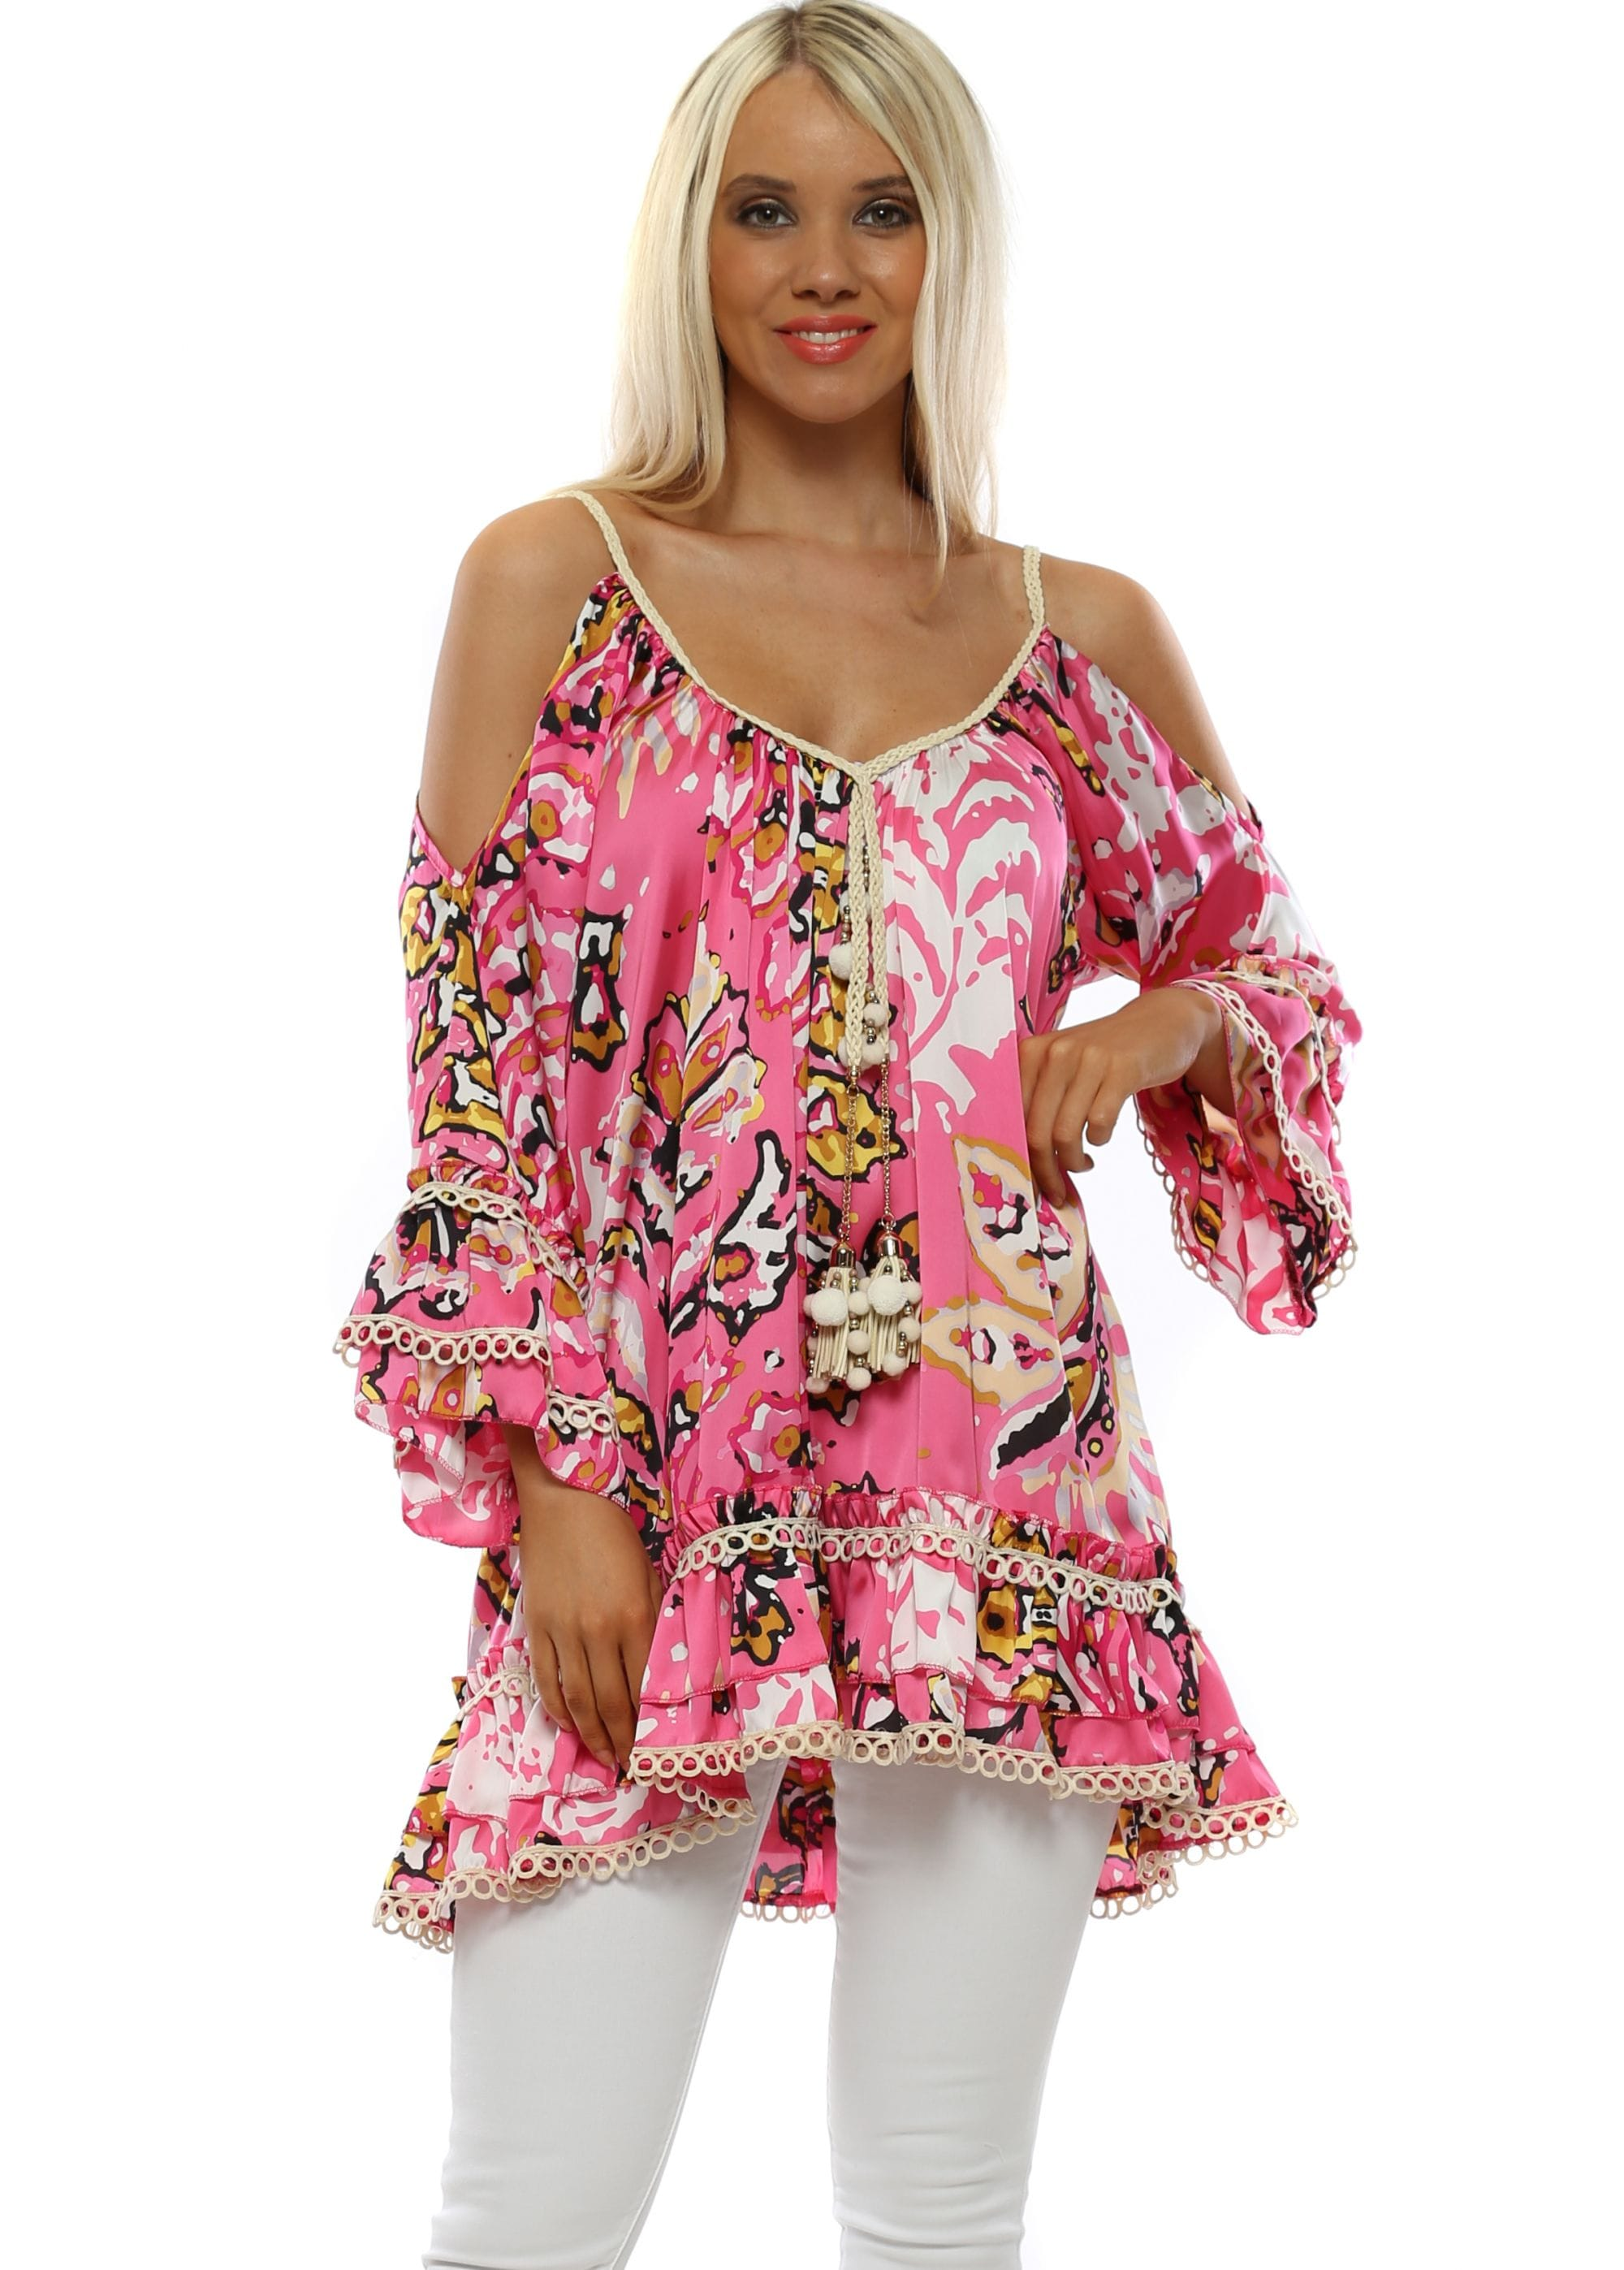 f7778927ea5bab Port Boutique Pink Top